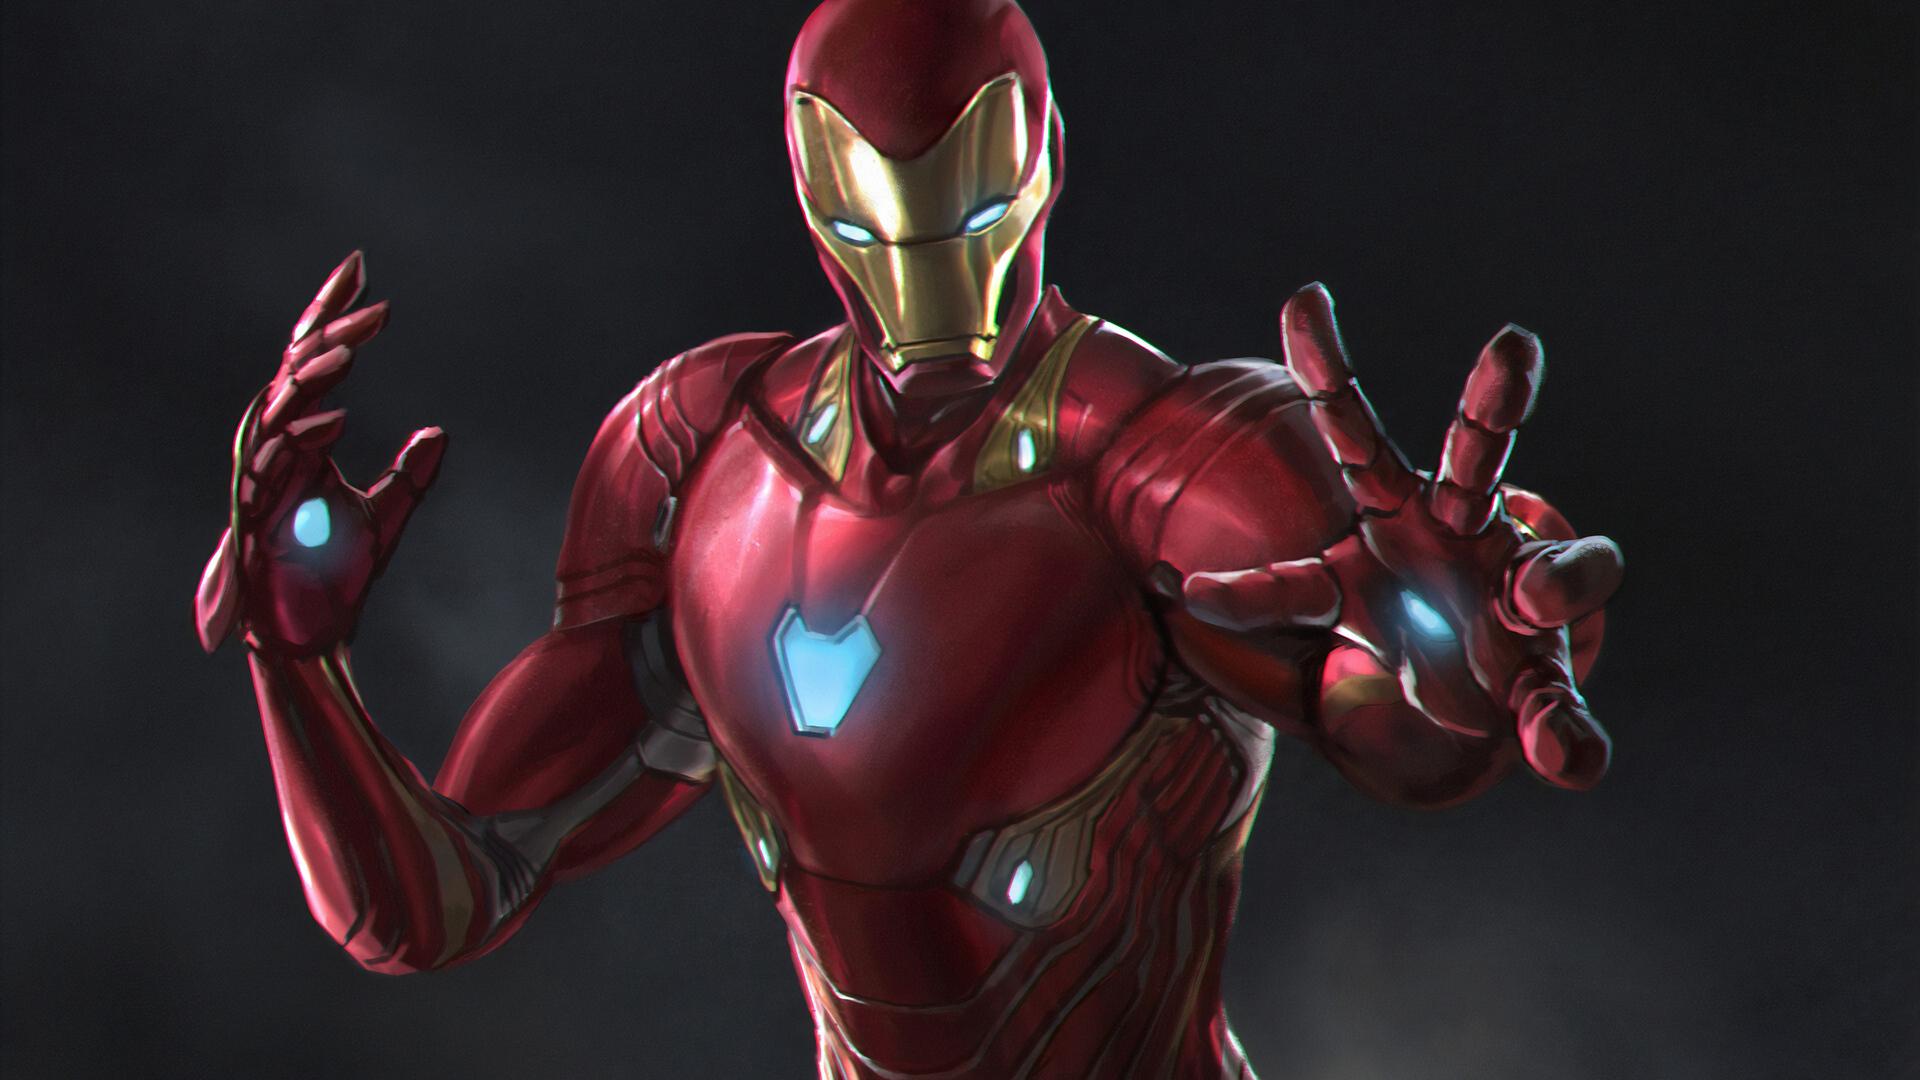 1920x1080 Iron Man Newart Laptop Full Hd 1080p Hd 4k